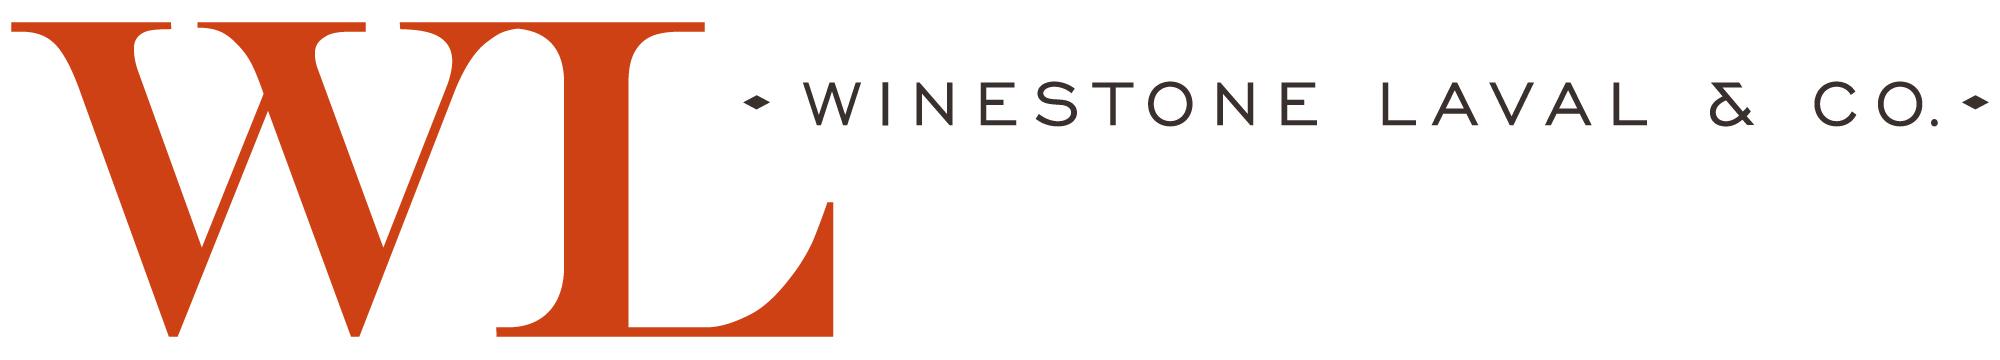 WL&Co. Logo.Feb.2013